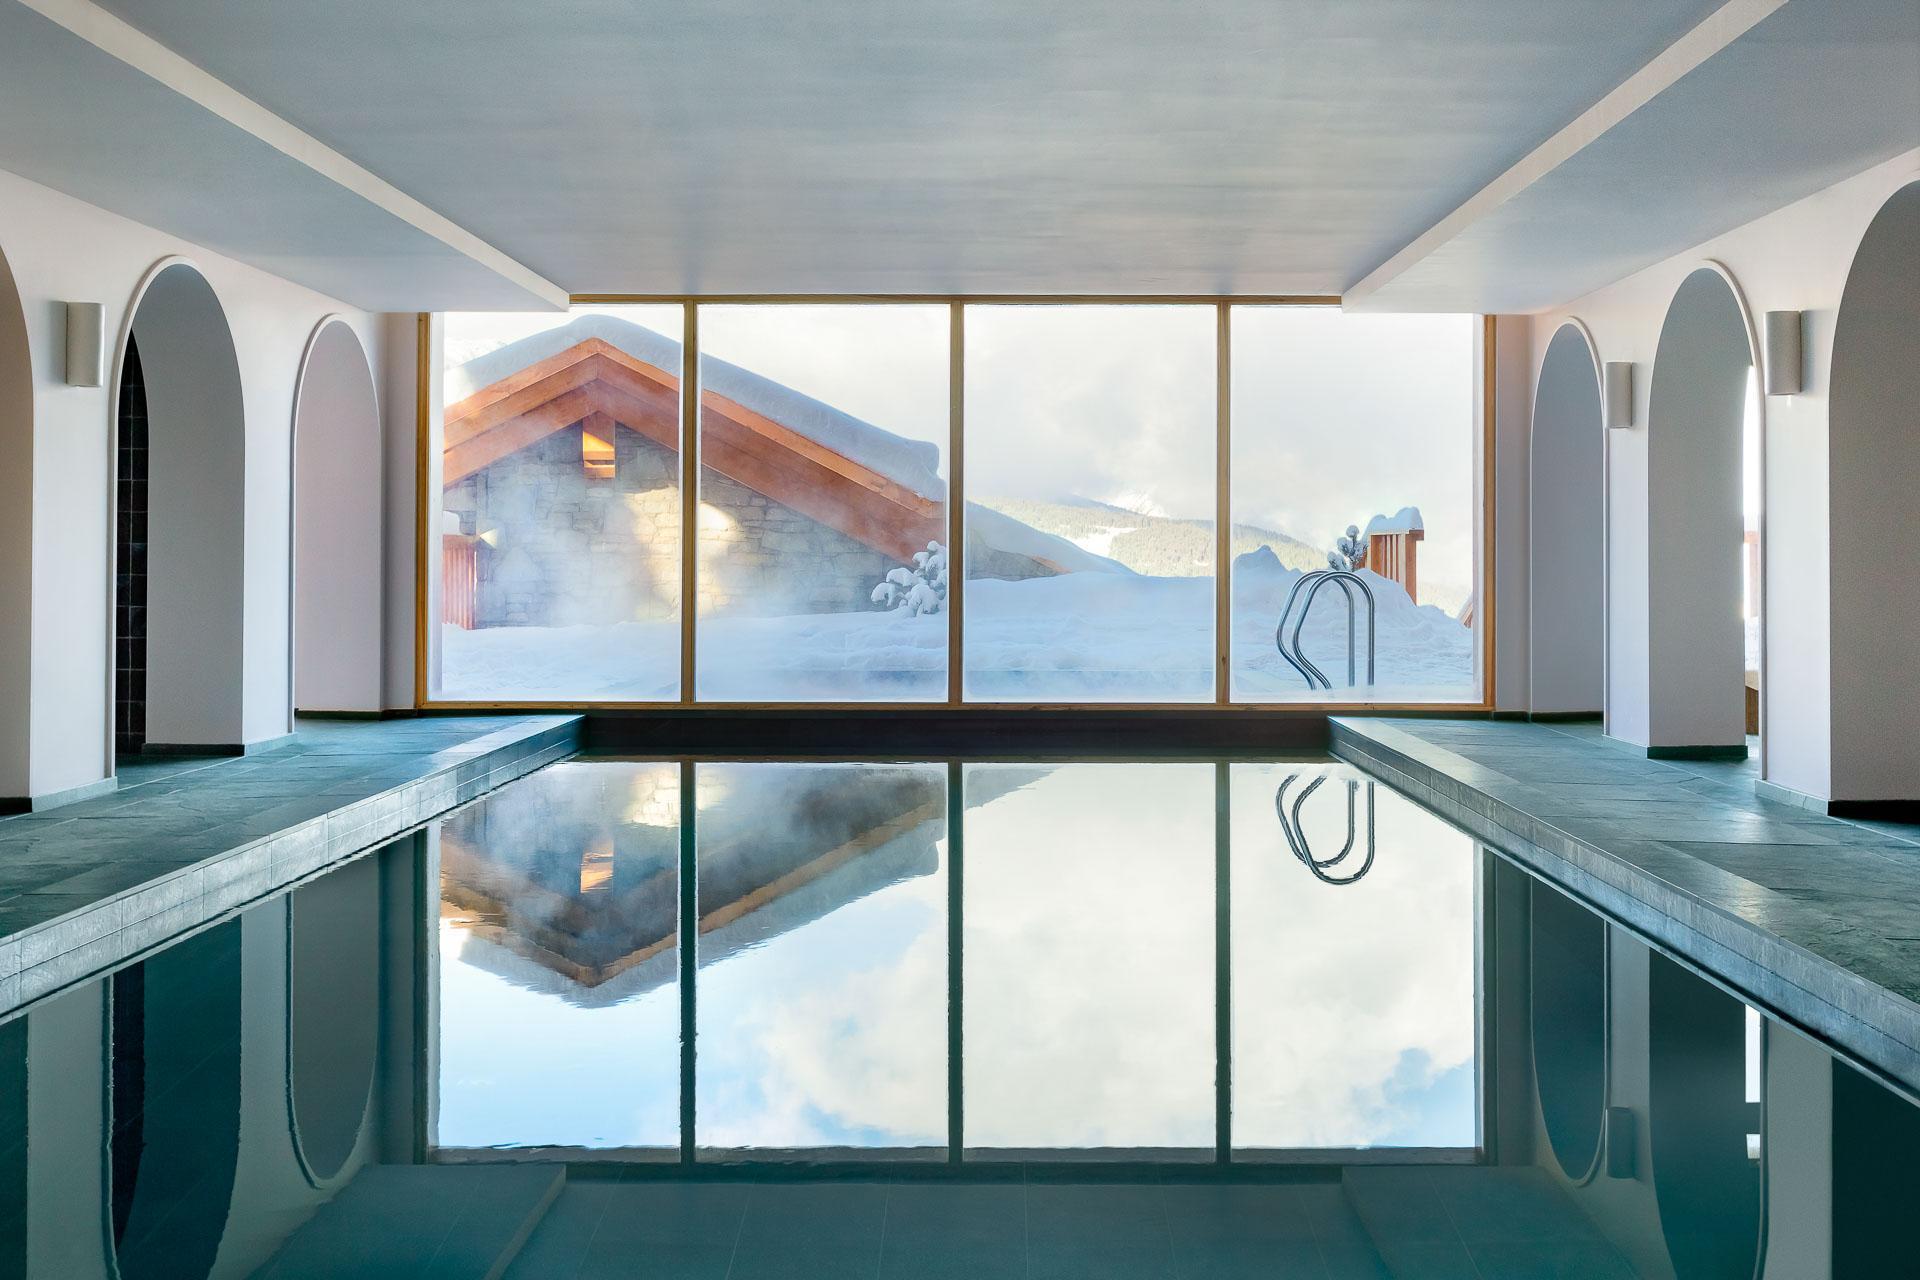 Le Coucou Méribel – La piscine adjacente au spa Tata Harper © Jérôme Galland